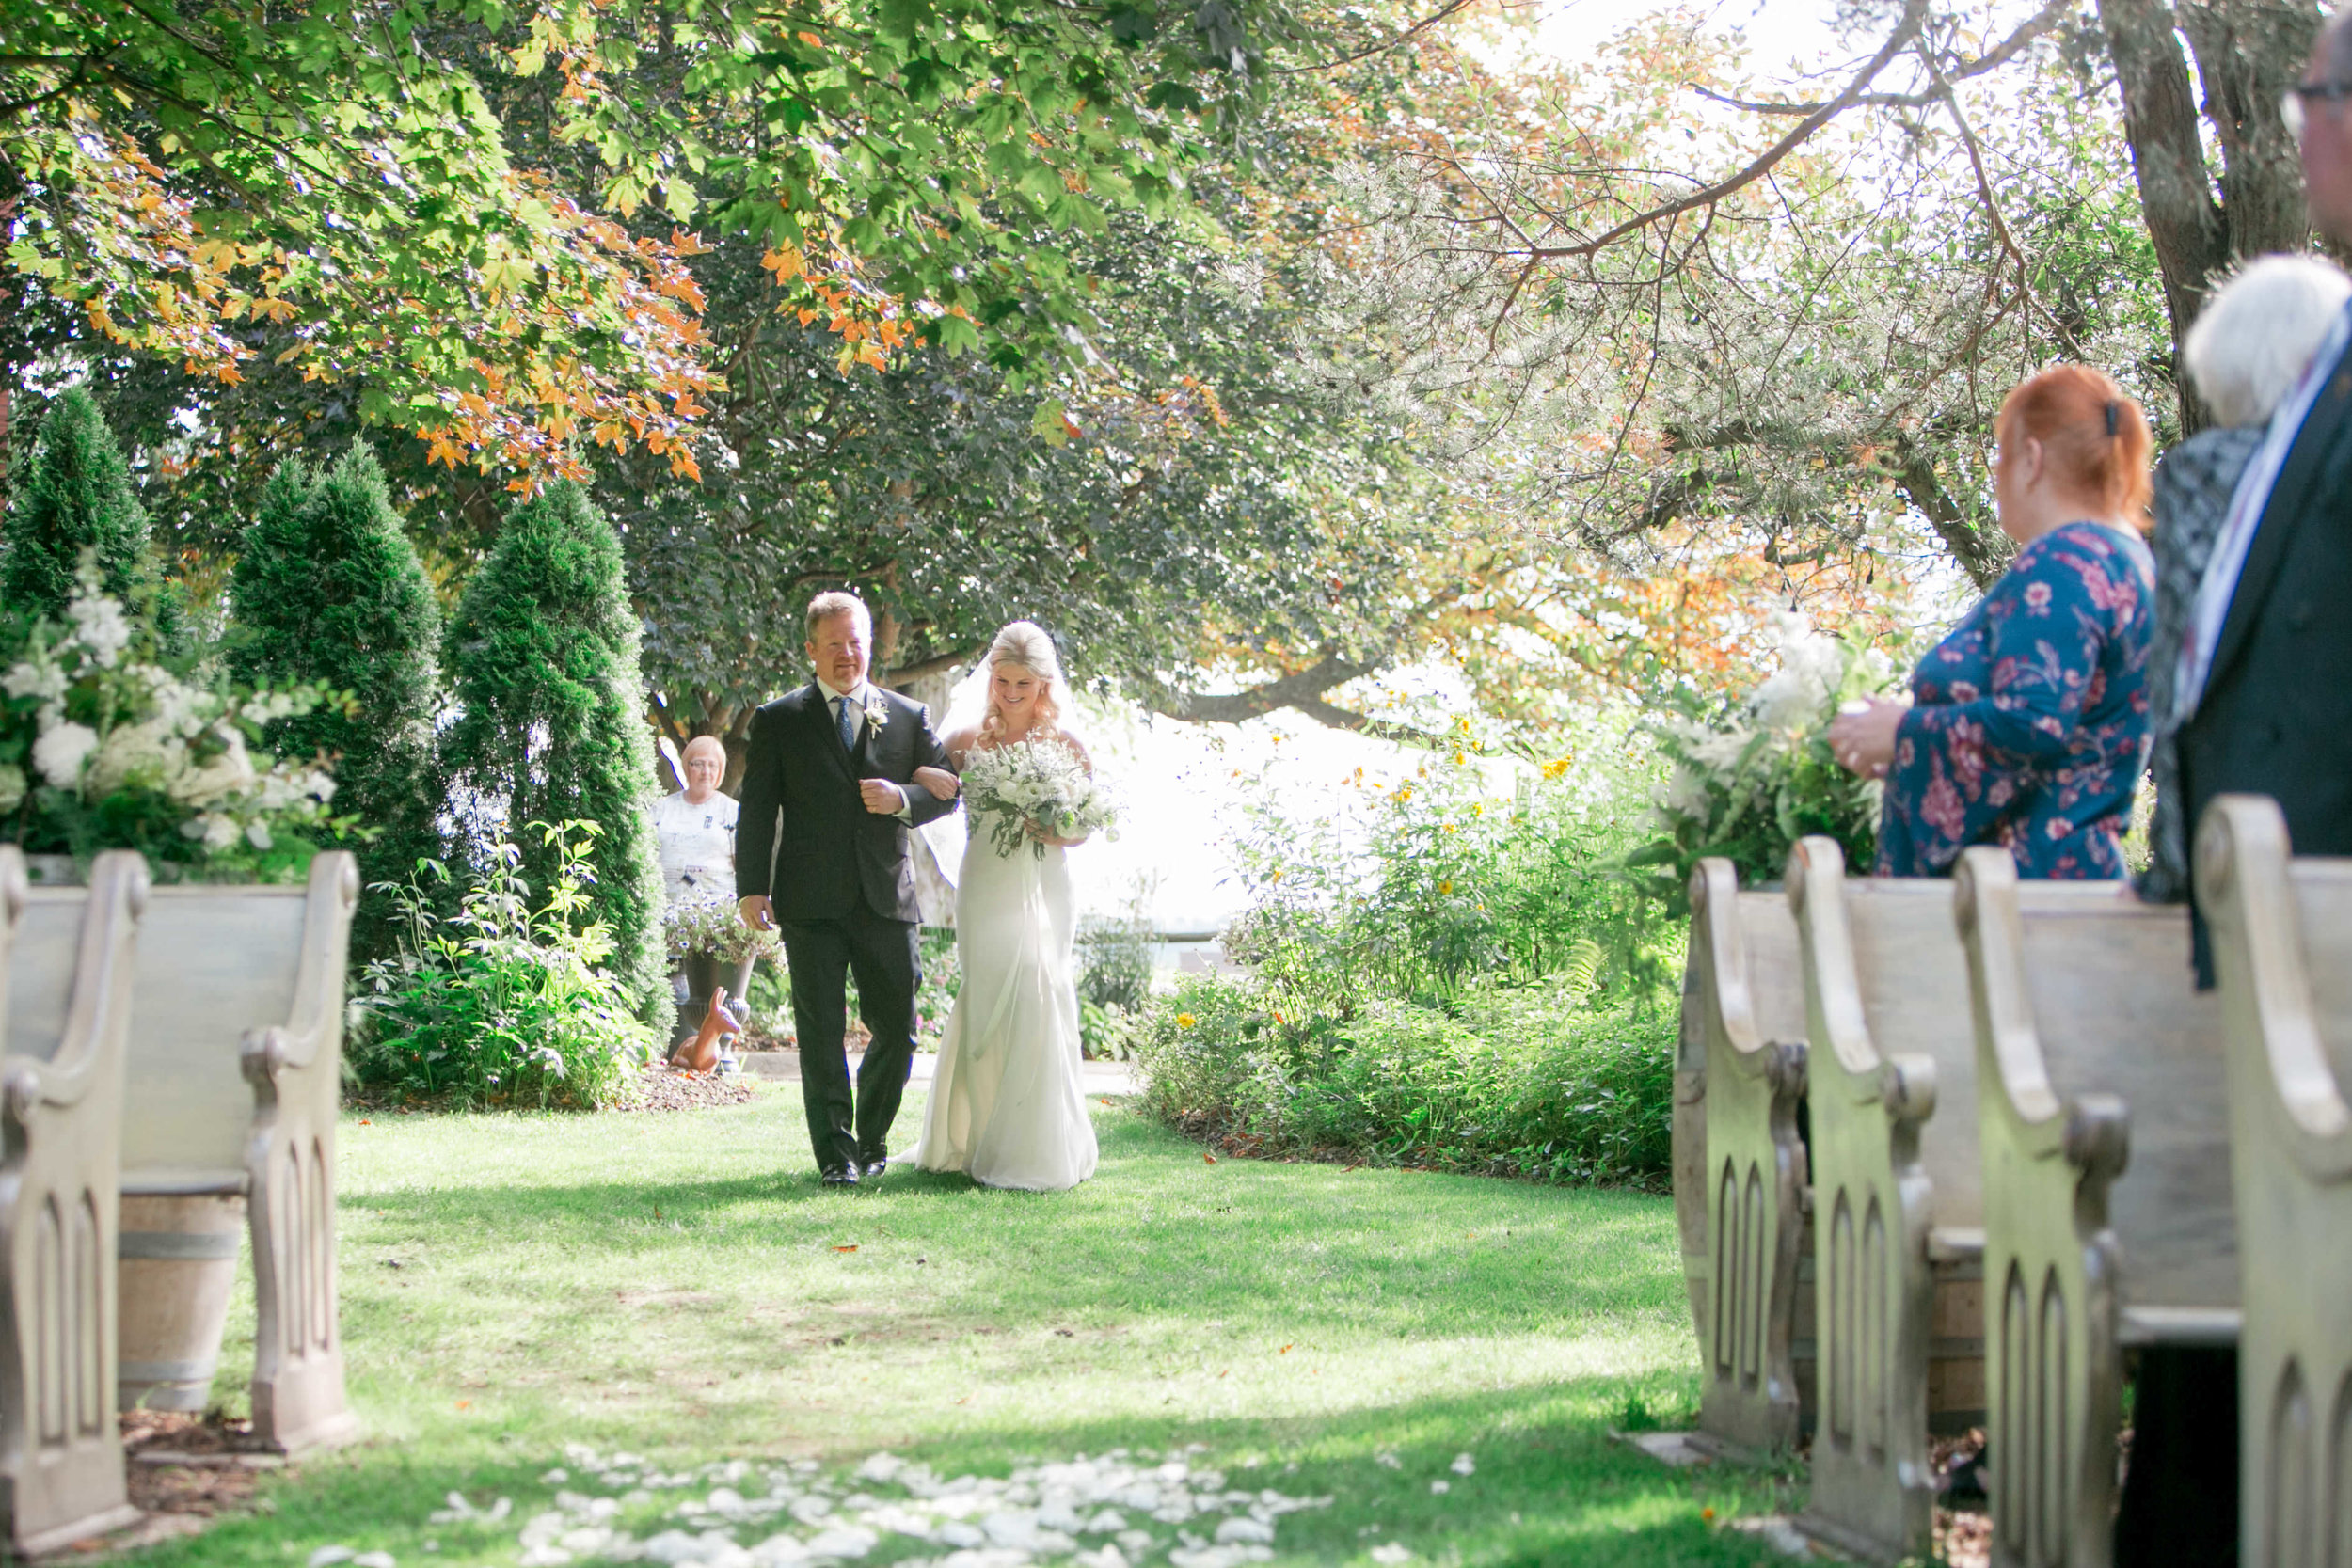 Maddy___Brandon___Daniel_Ricci_Weddings_High_Res._Finals_261.jpg